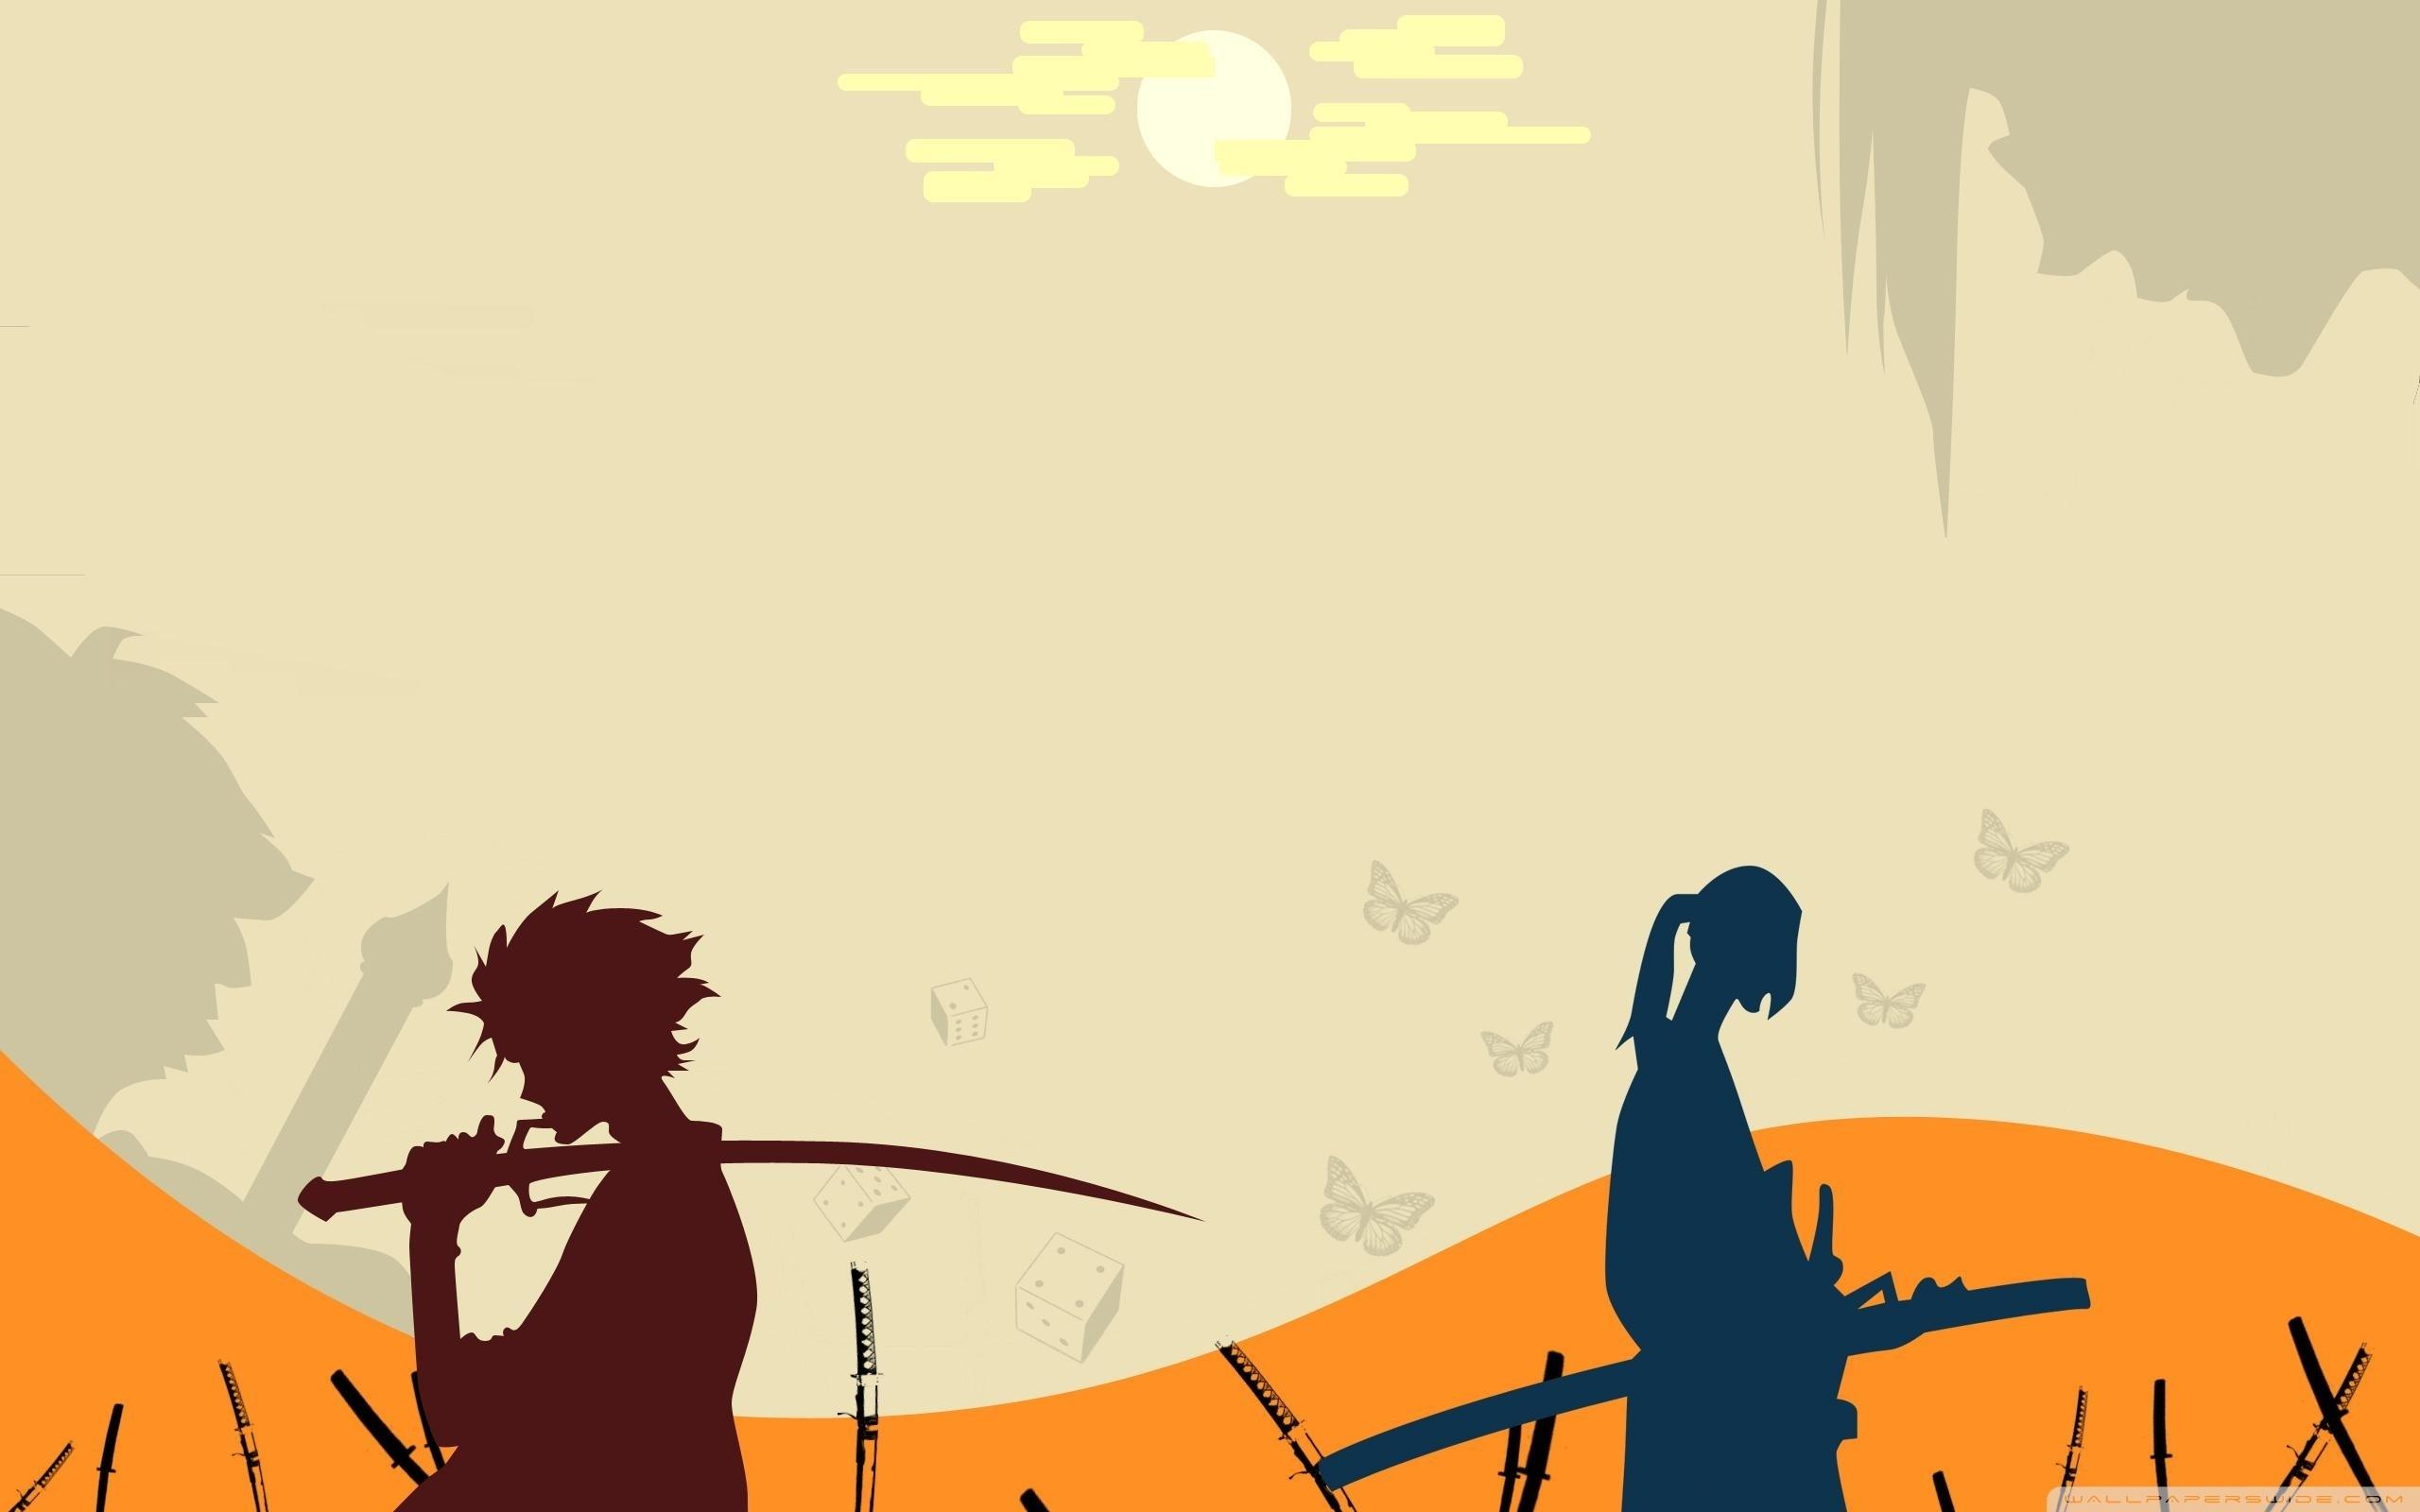 samurai champloo ❤ 4k hd desktop wallpaper for 4k ultra hd tv